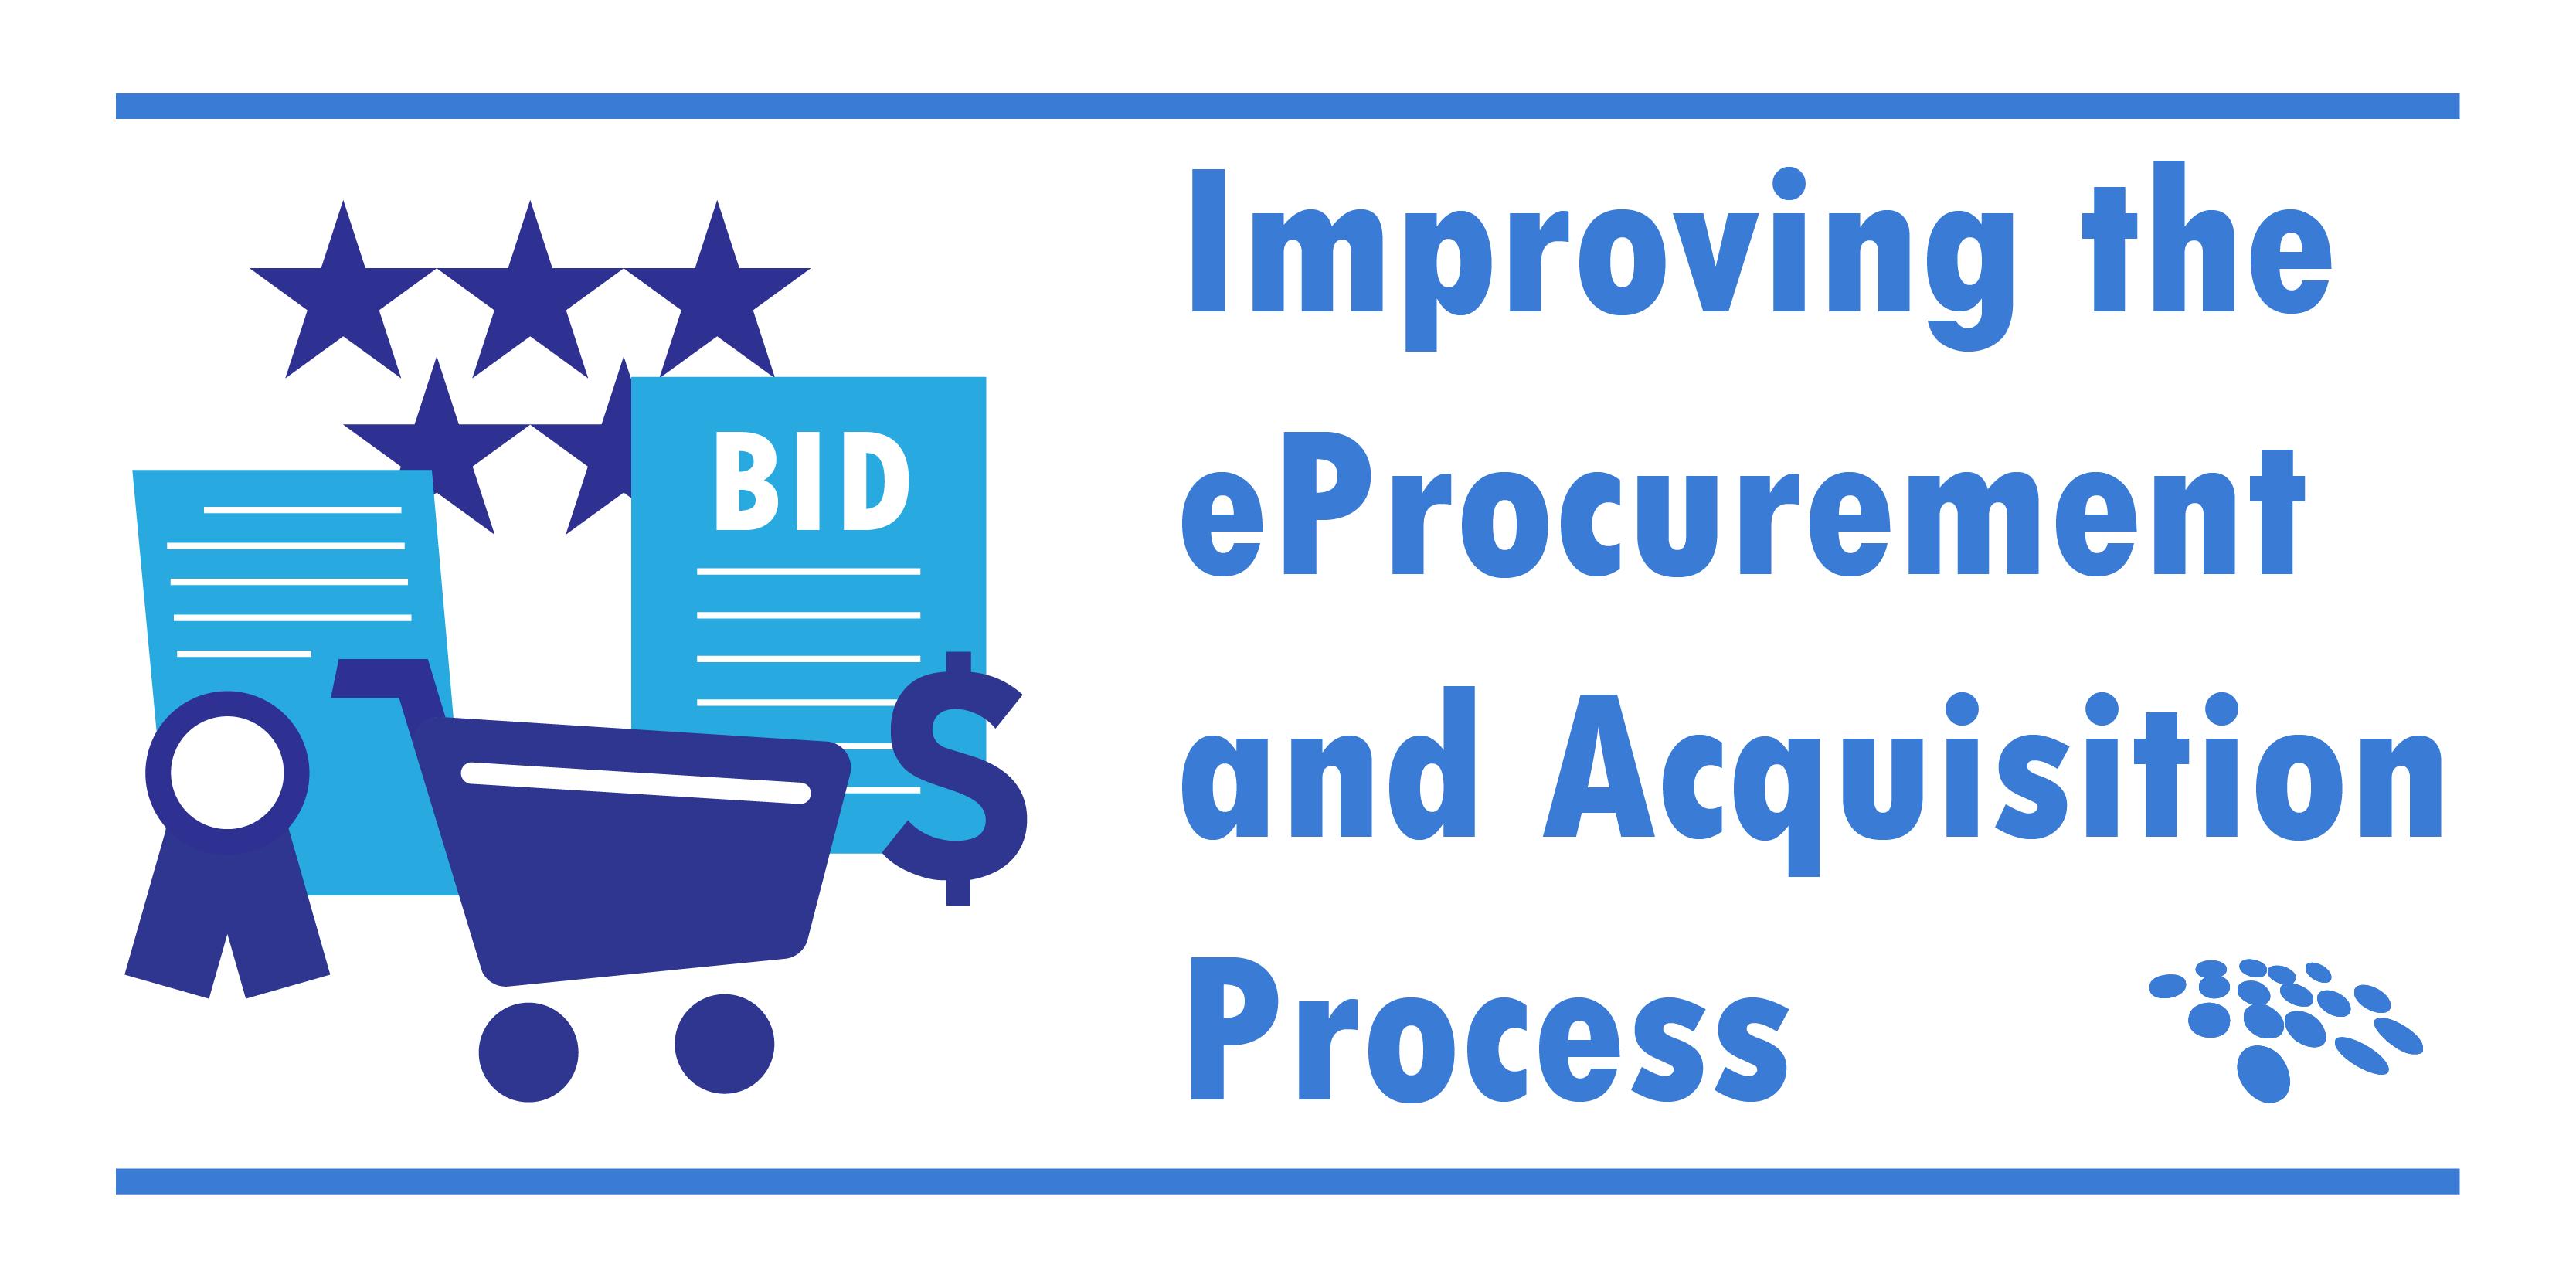 eProcurement and Acquisition Process